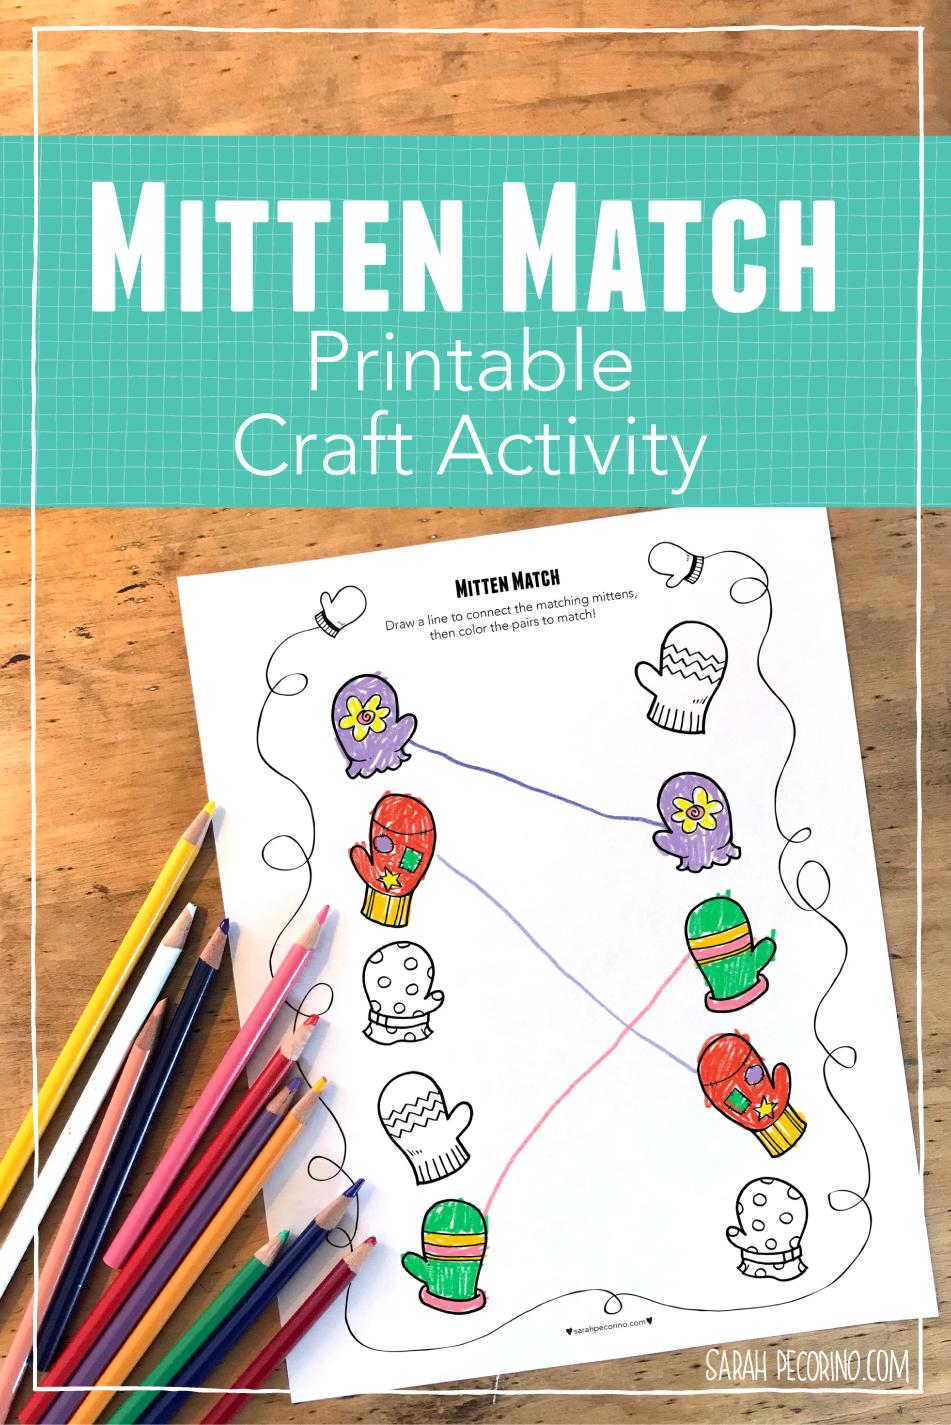 Sarah Pecorino Mitten Match Printable Activity Page great for preschoolers